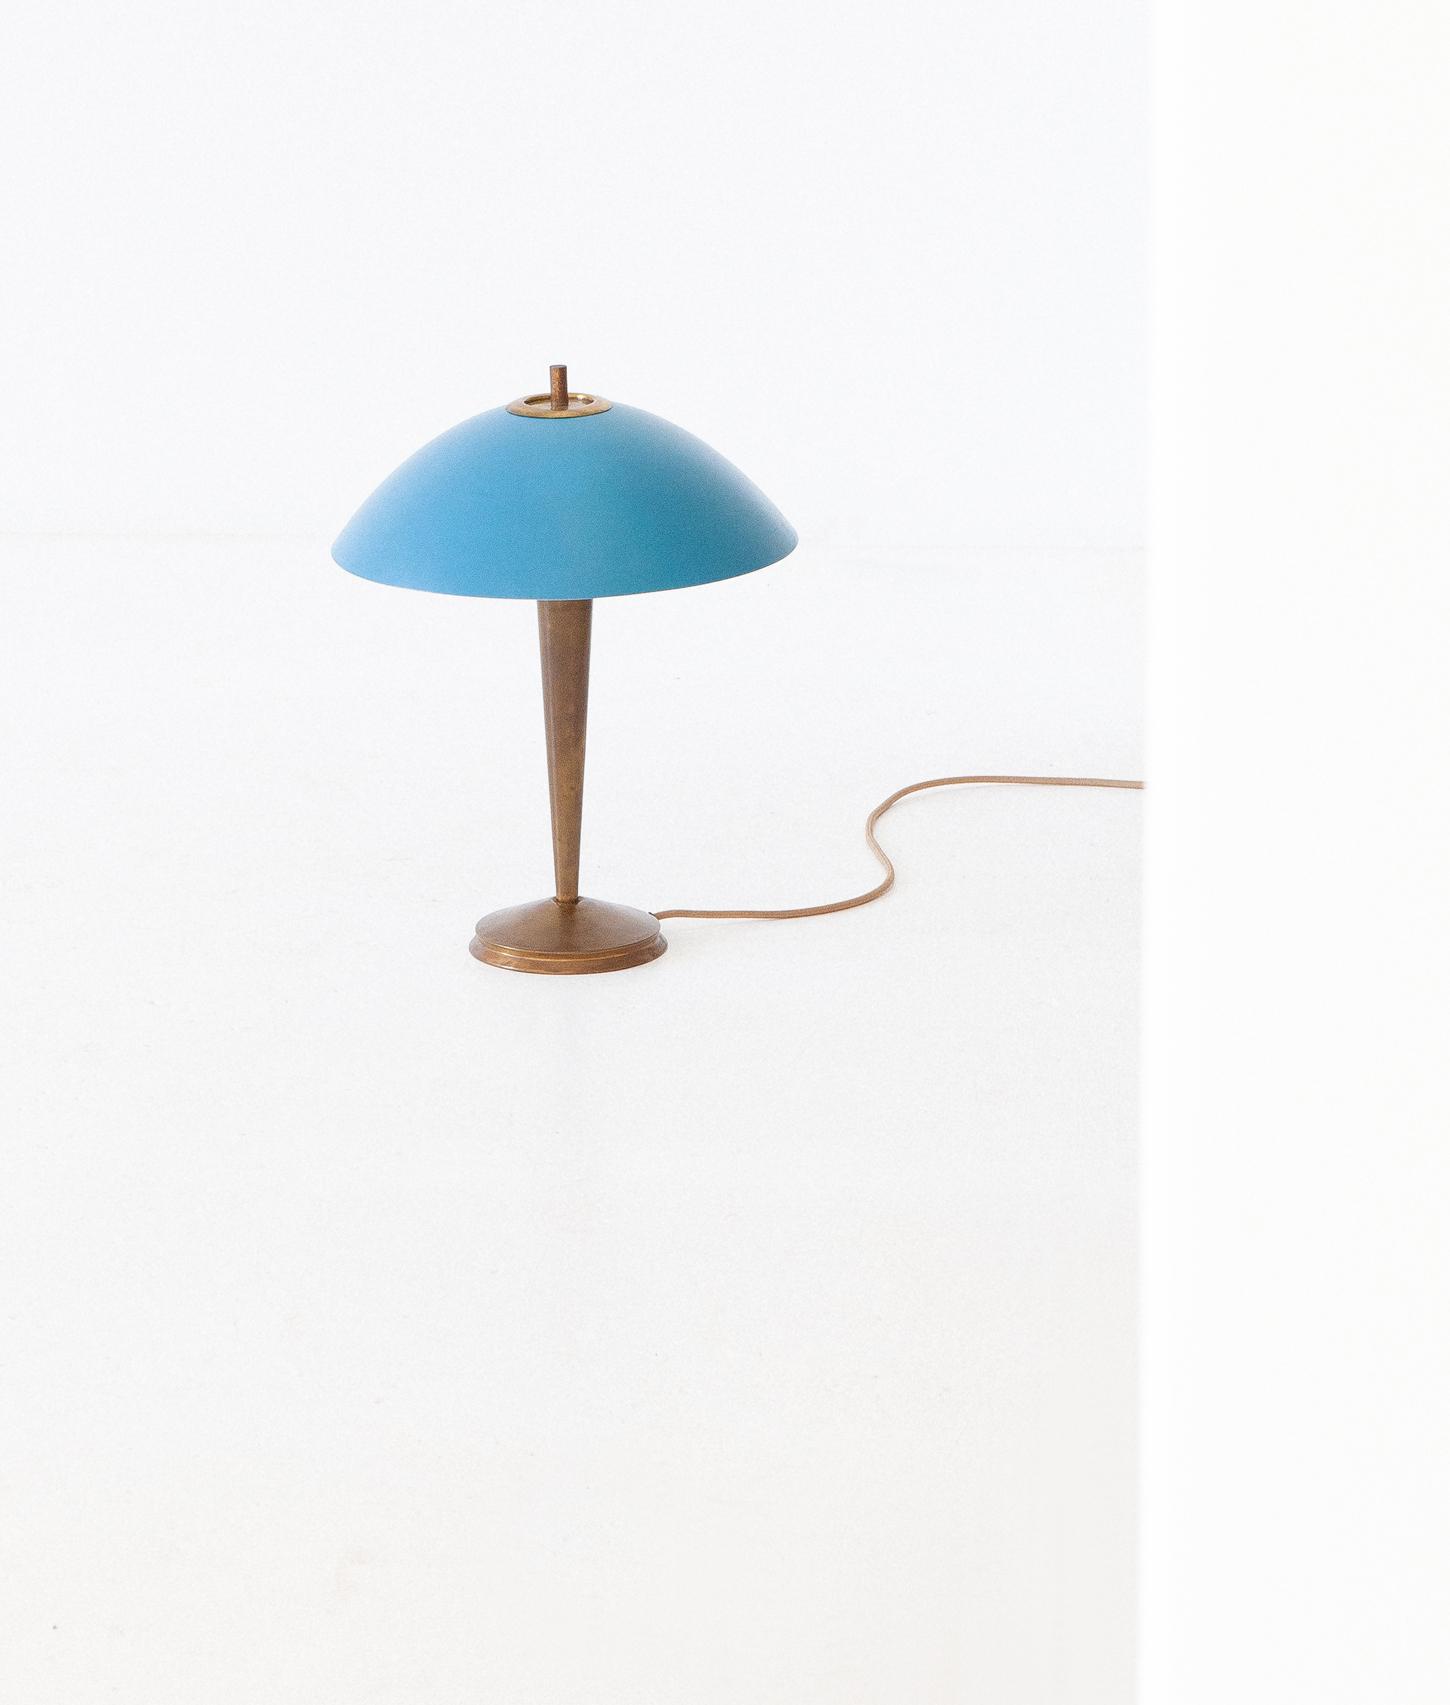 1950s-italian-blue-brass-table-lamp-3-L78